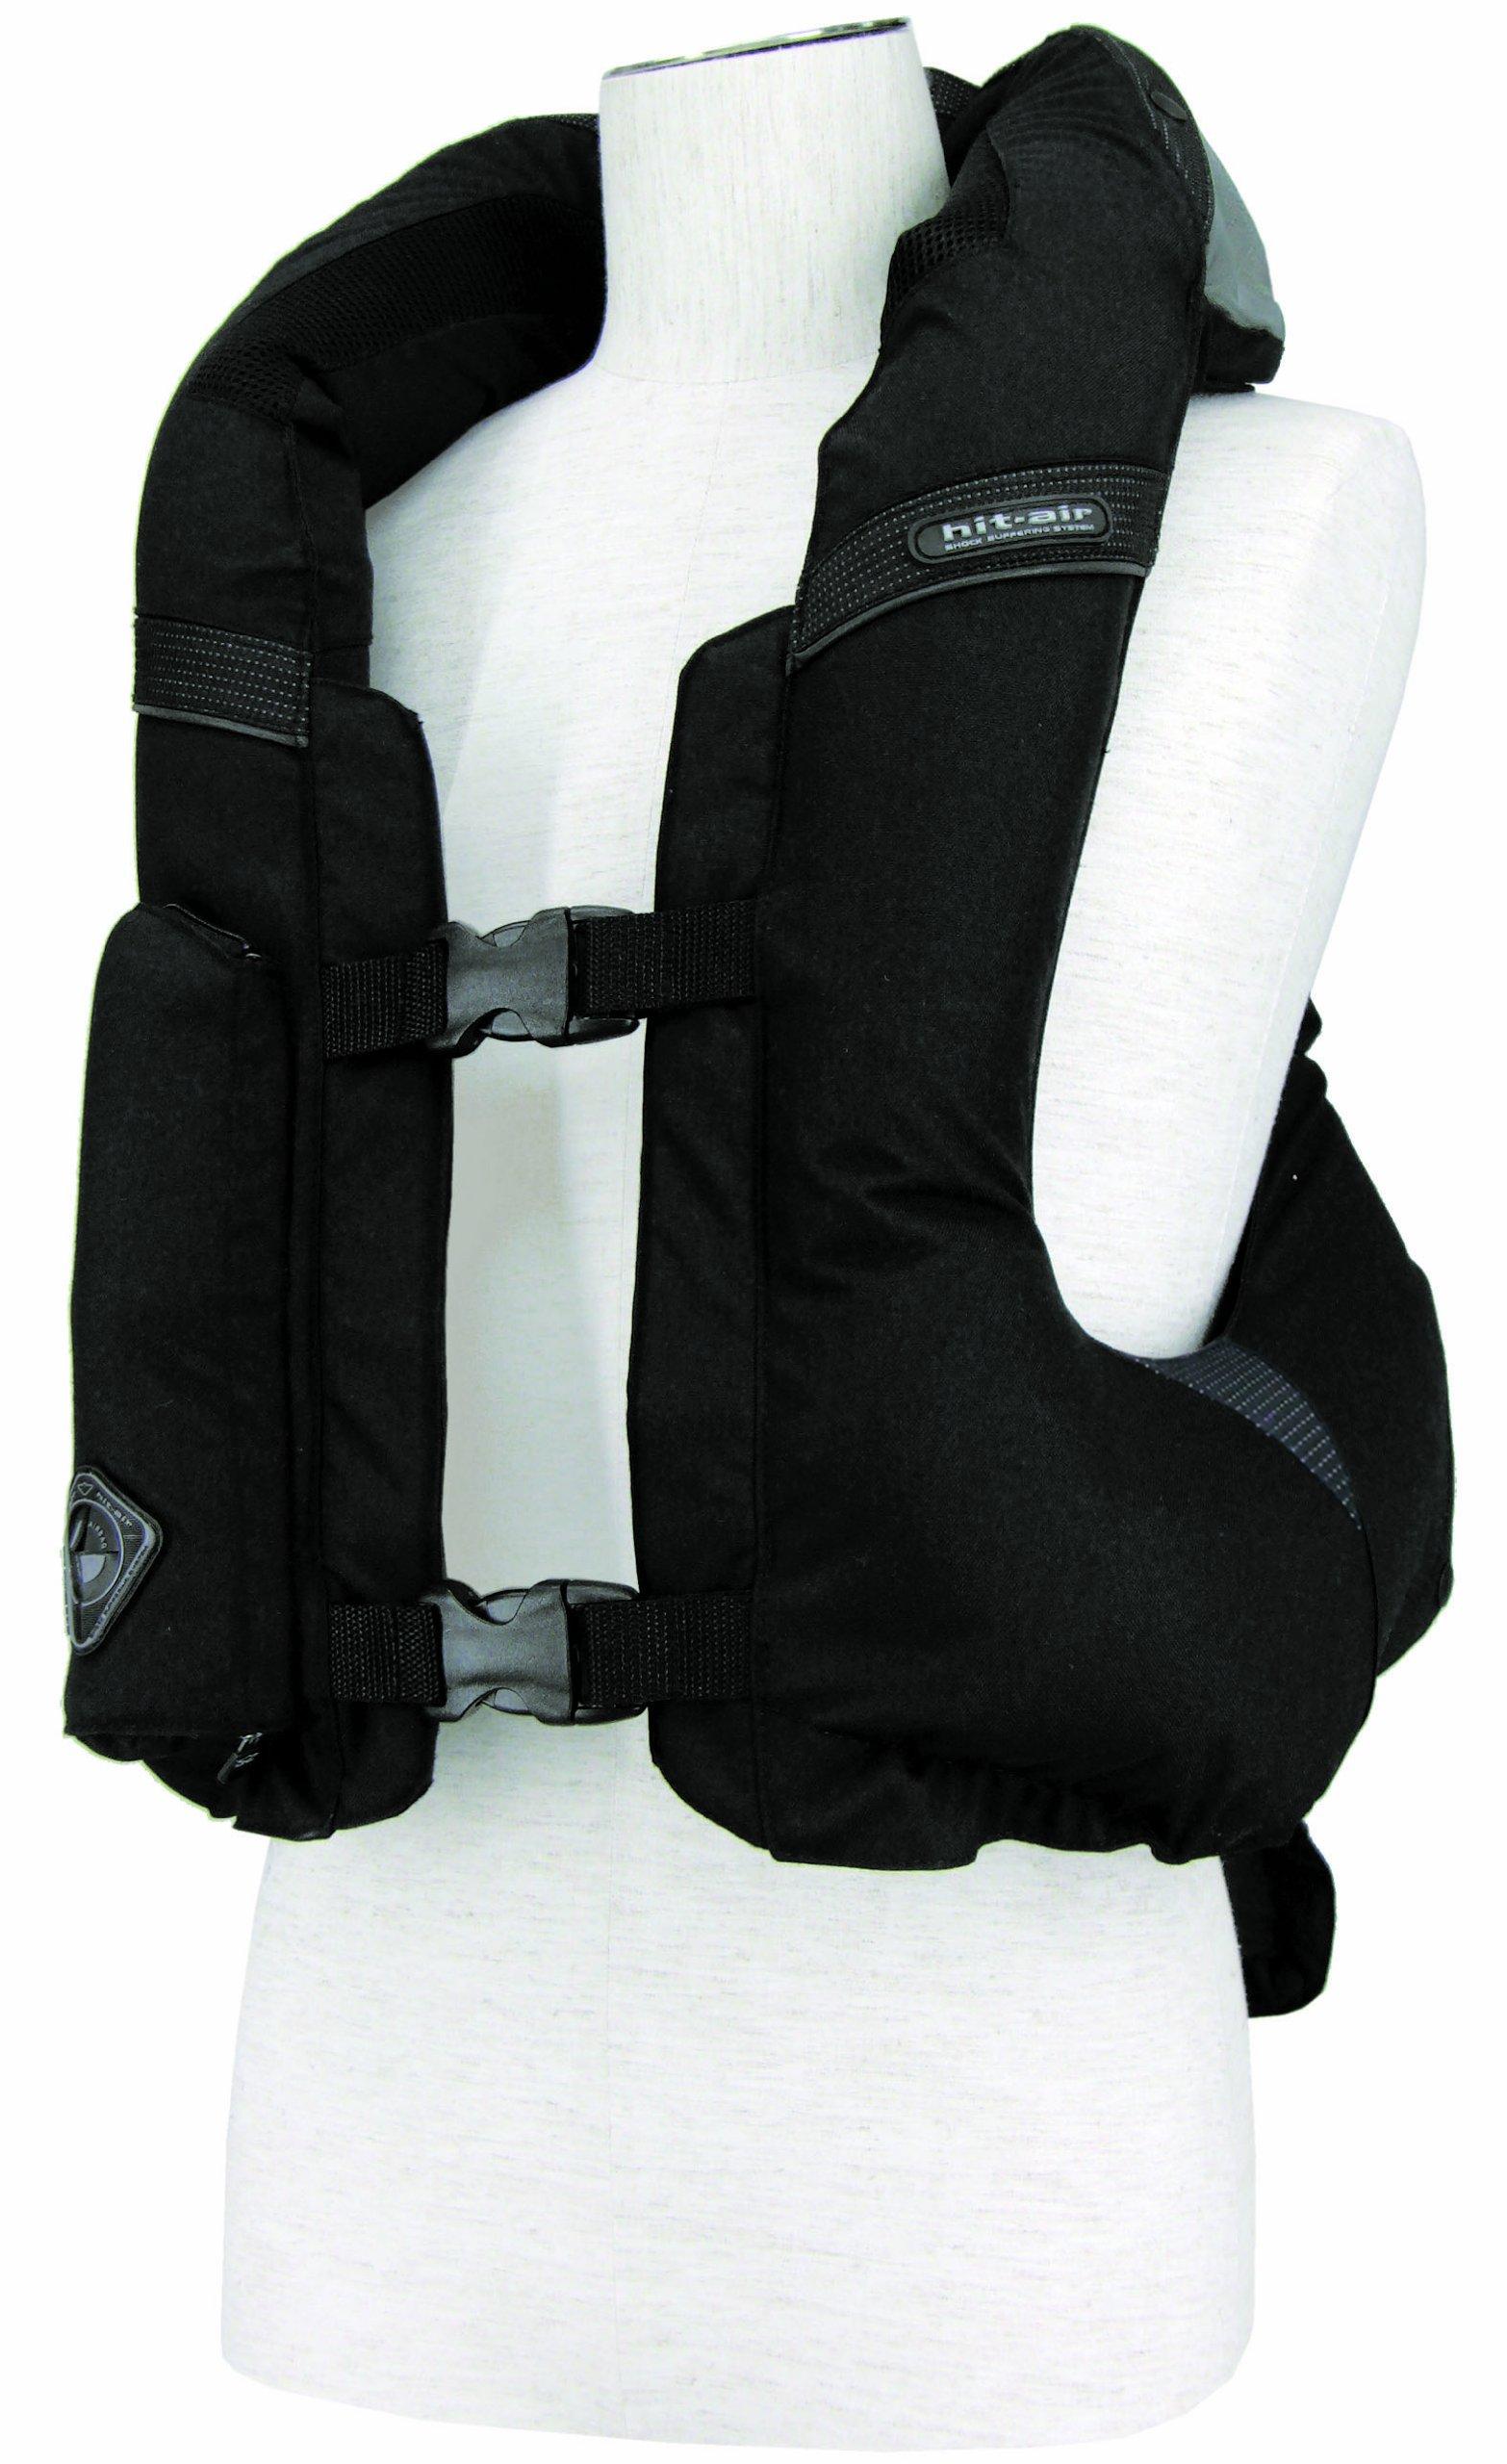 Hit-Air inflatable Vest ''MLV-C'' in Black Size M